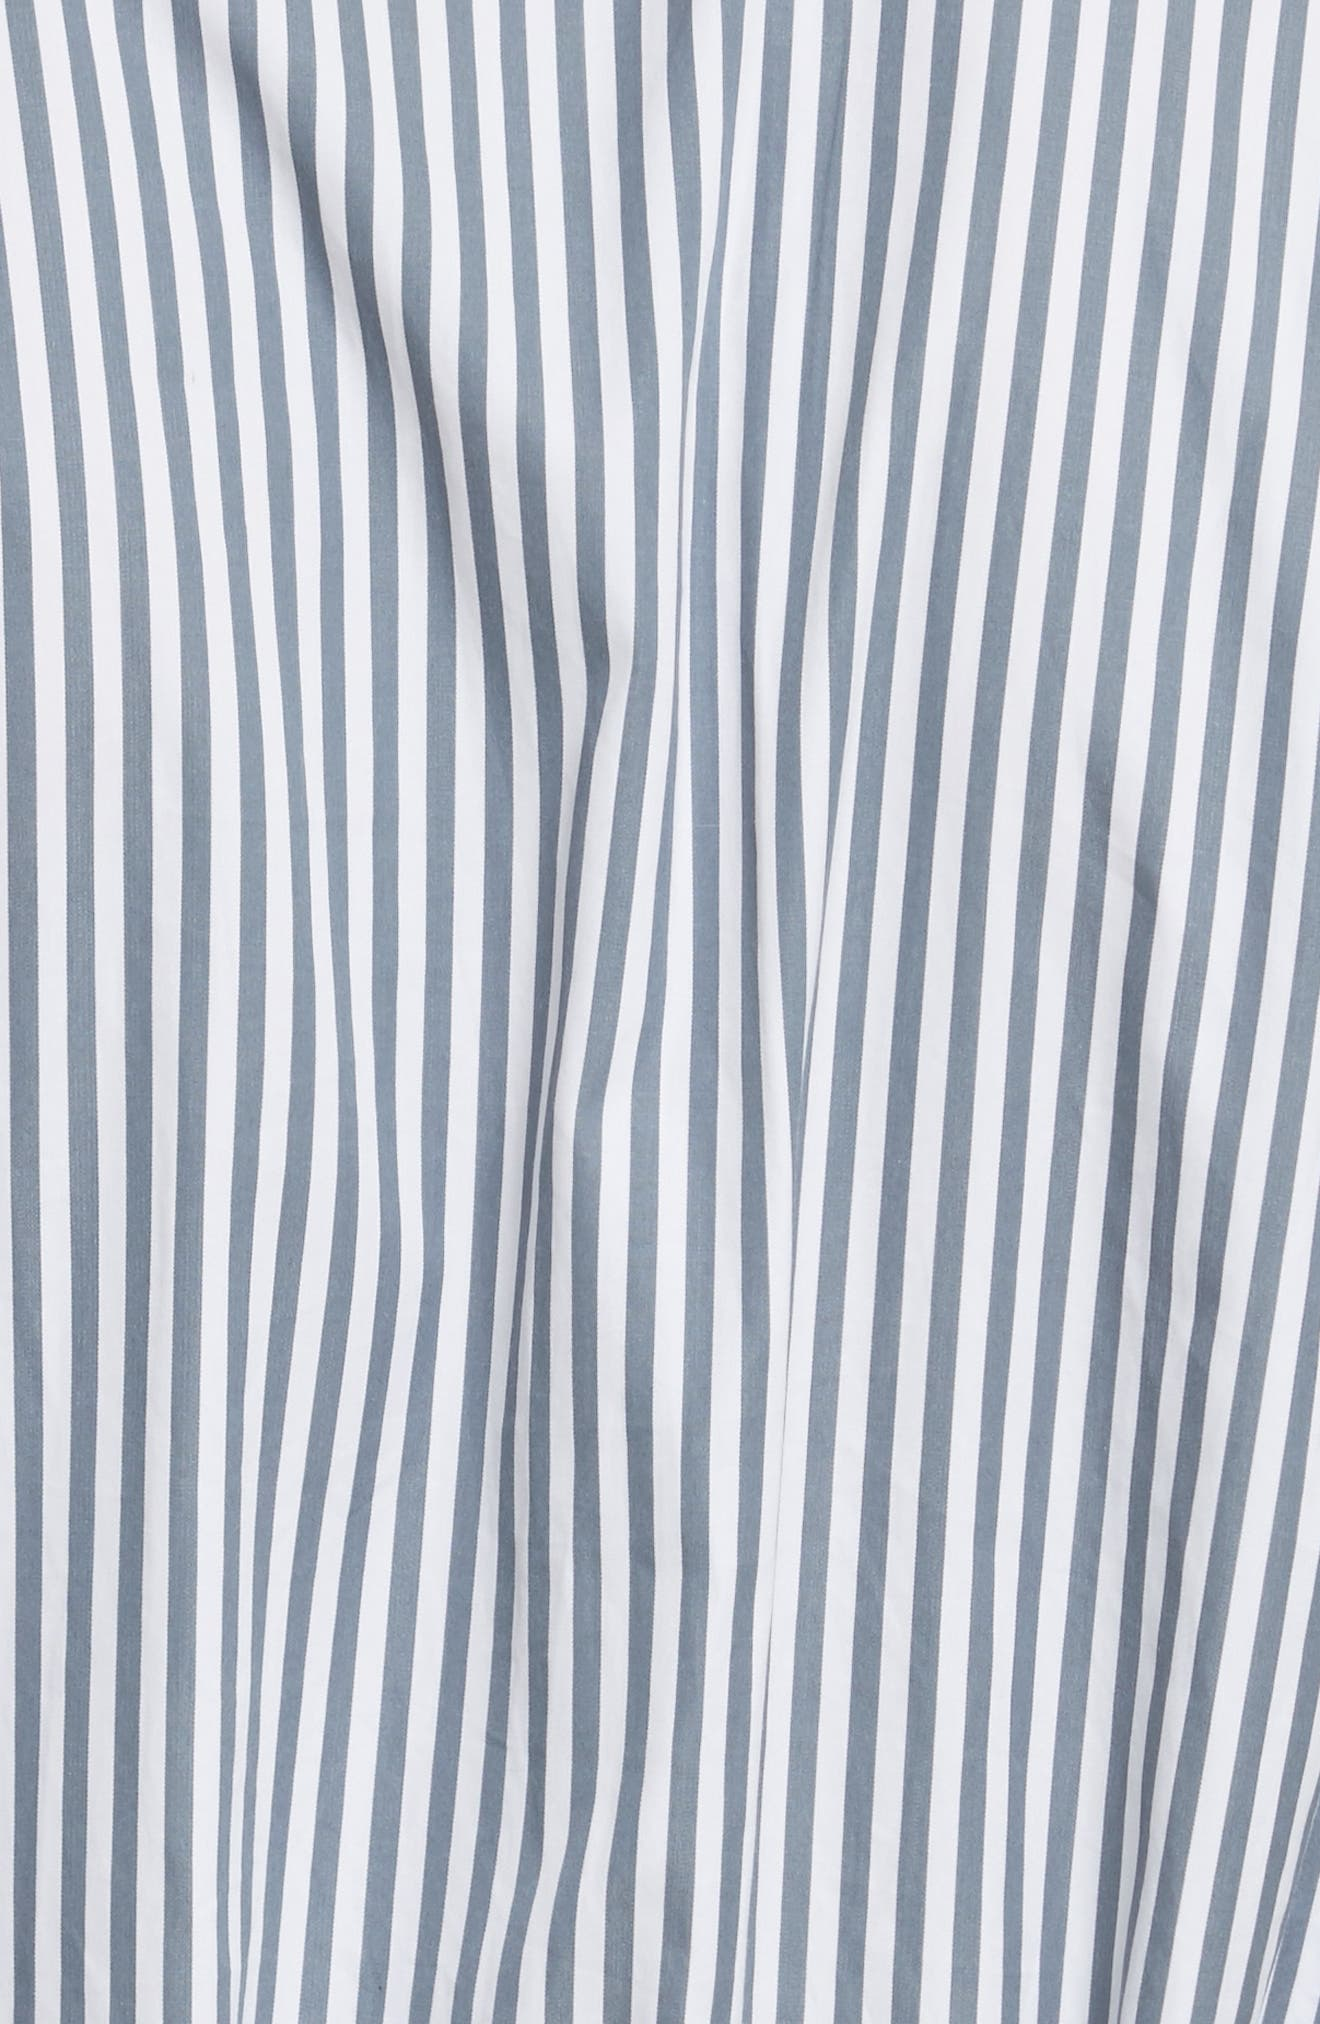 Candy Stripe Midi Dress,                             Alternate thumbnail 5, color,                             Ink